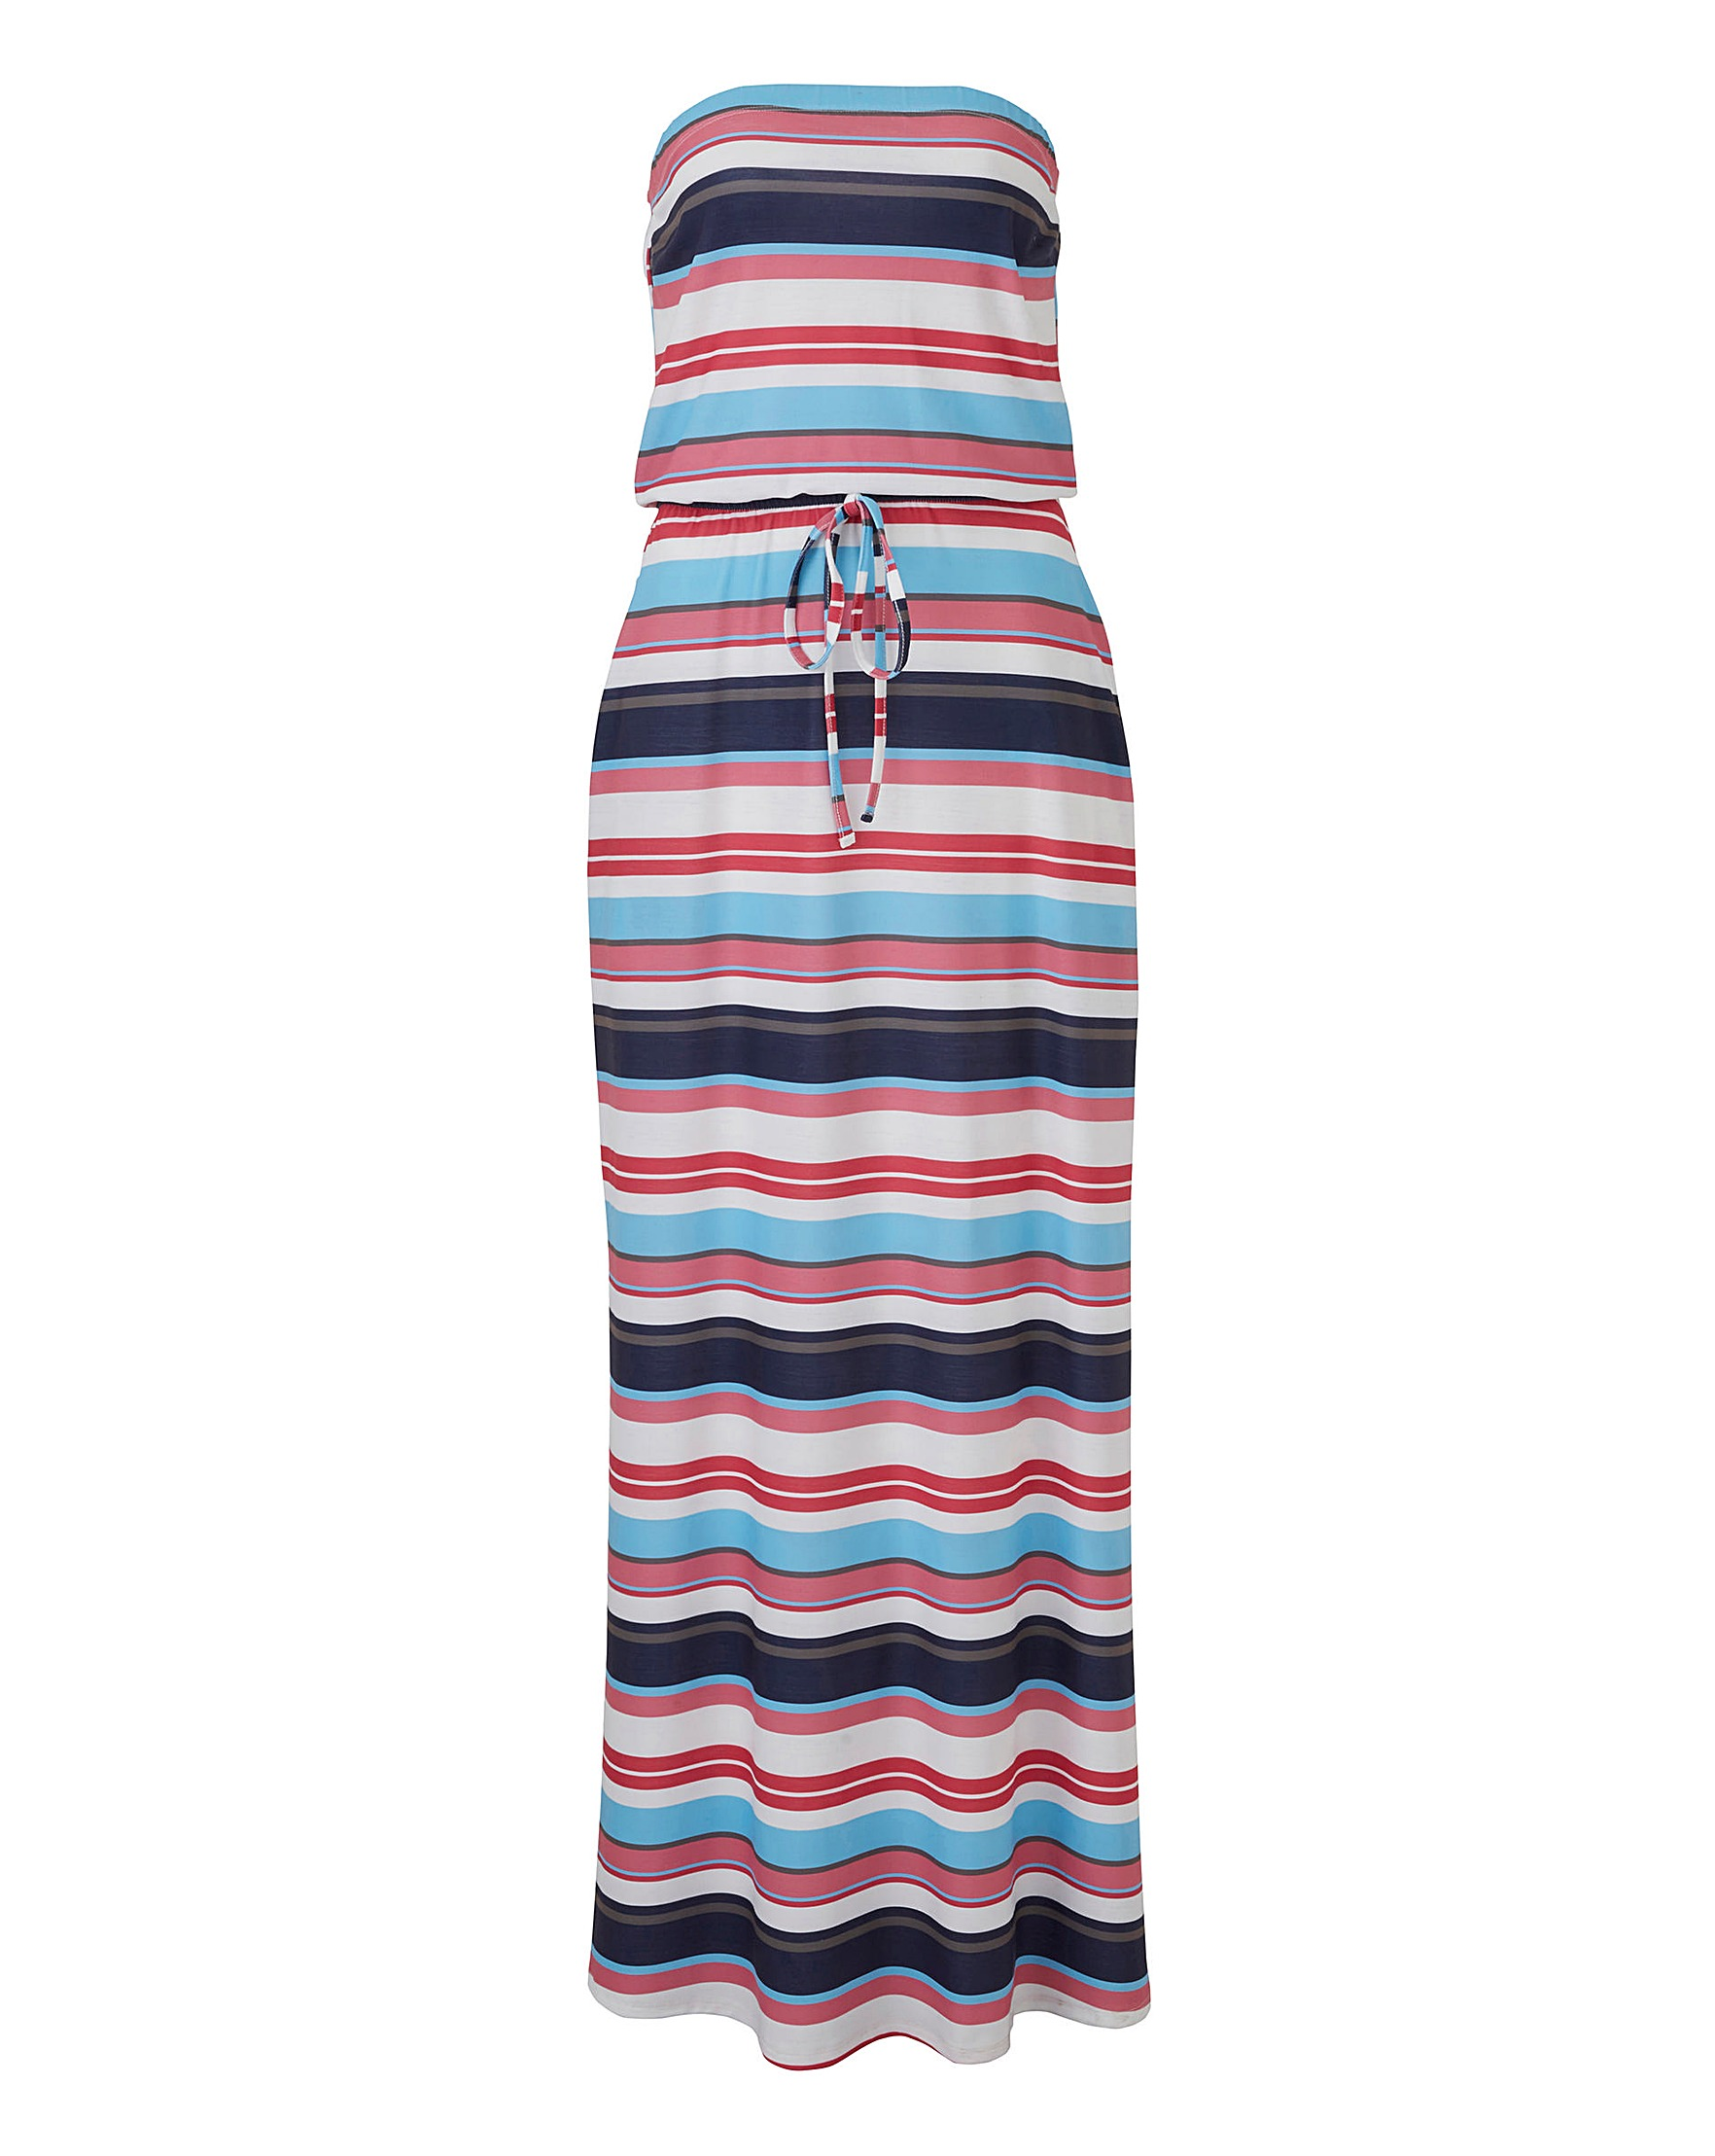 22d2746e45d Petite Summer Maxi Dresses - Gomes Weine AG